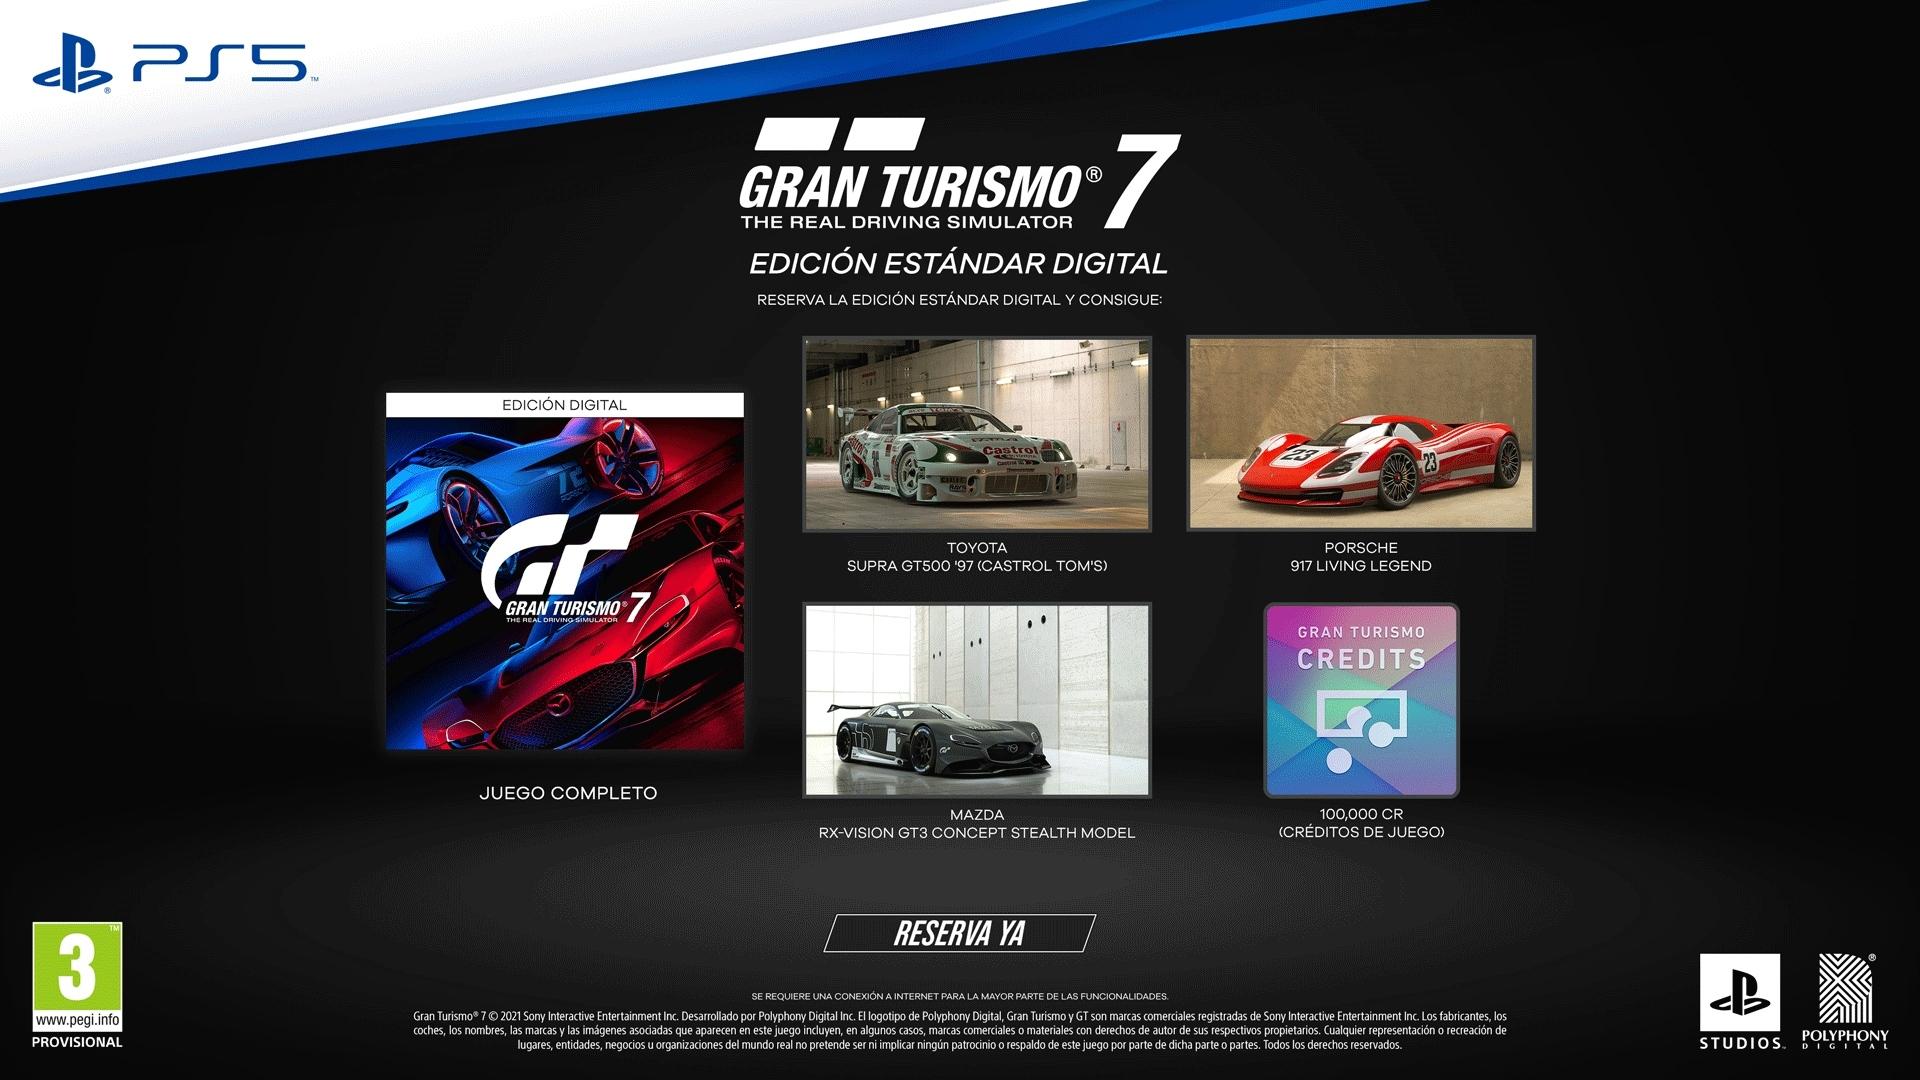 Gran Turismo 7 edición estándar